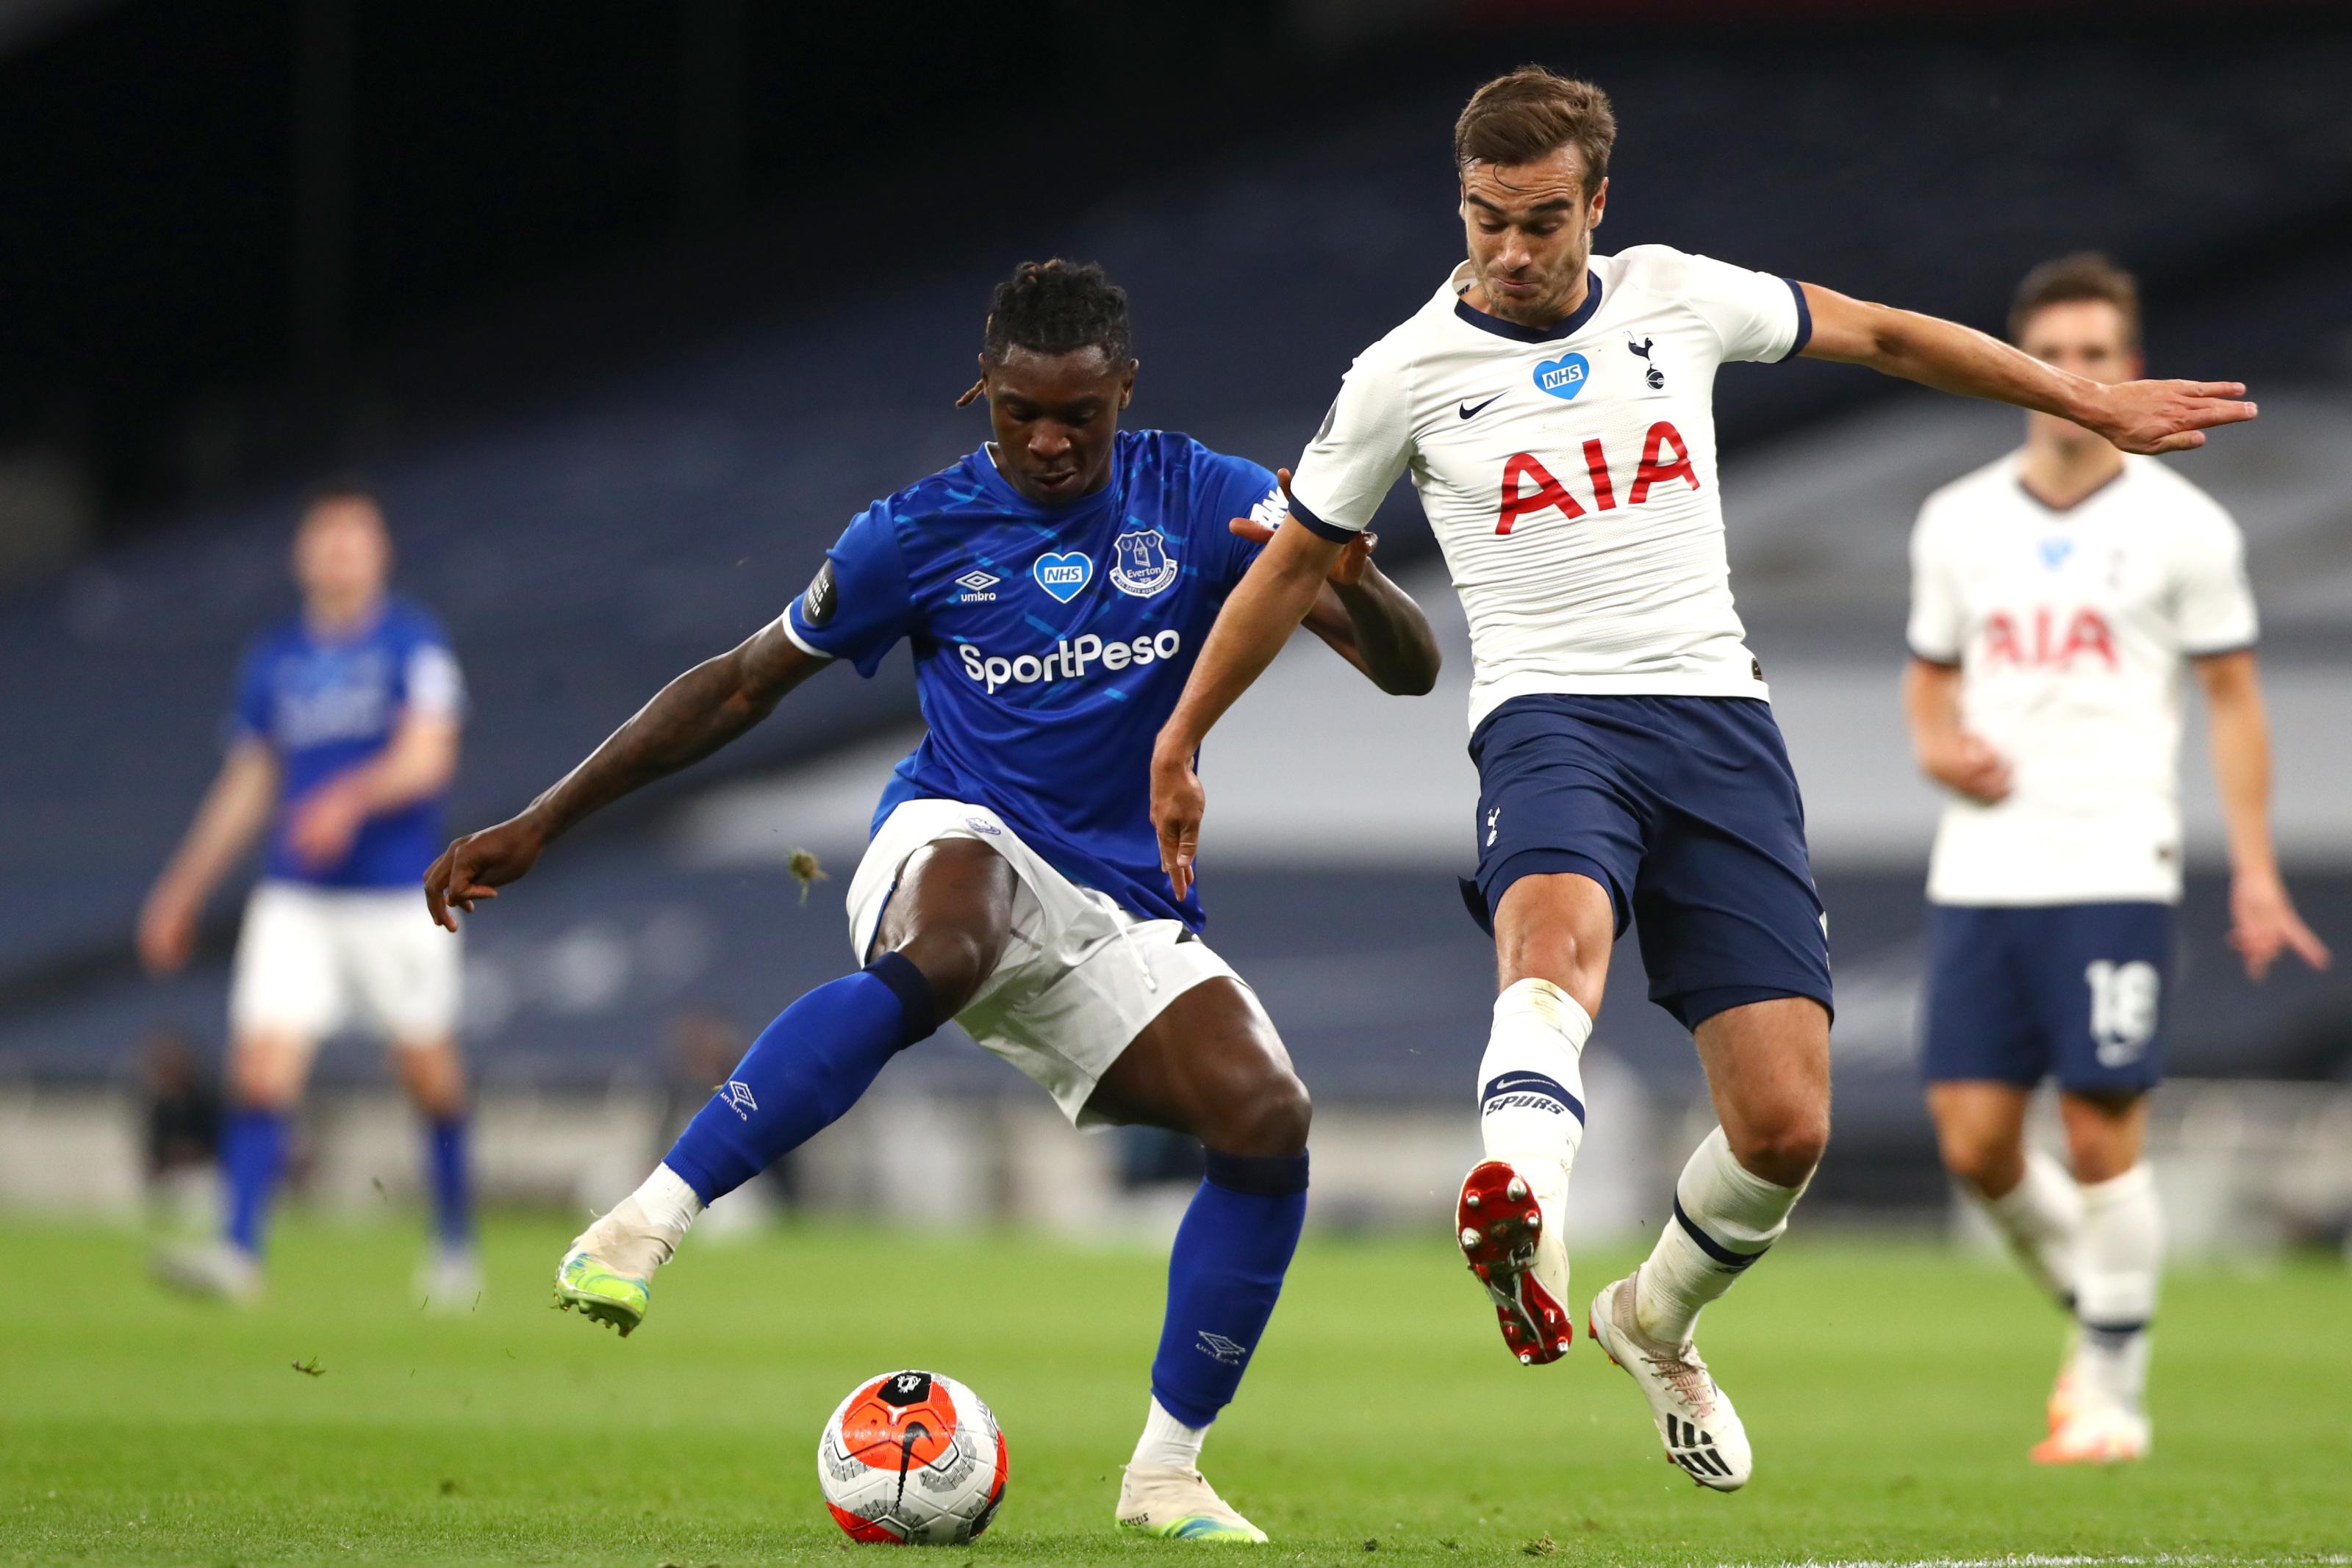 Everton vs Tottenham Hotspur: Major Injury Update ahead of the game